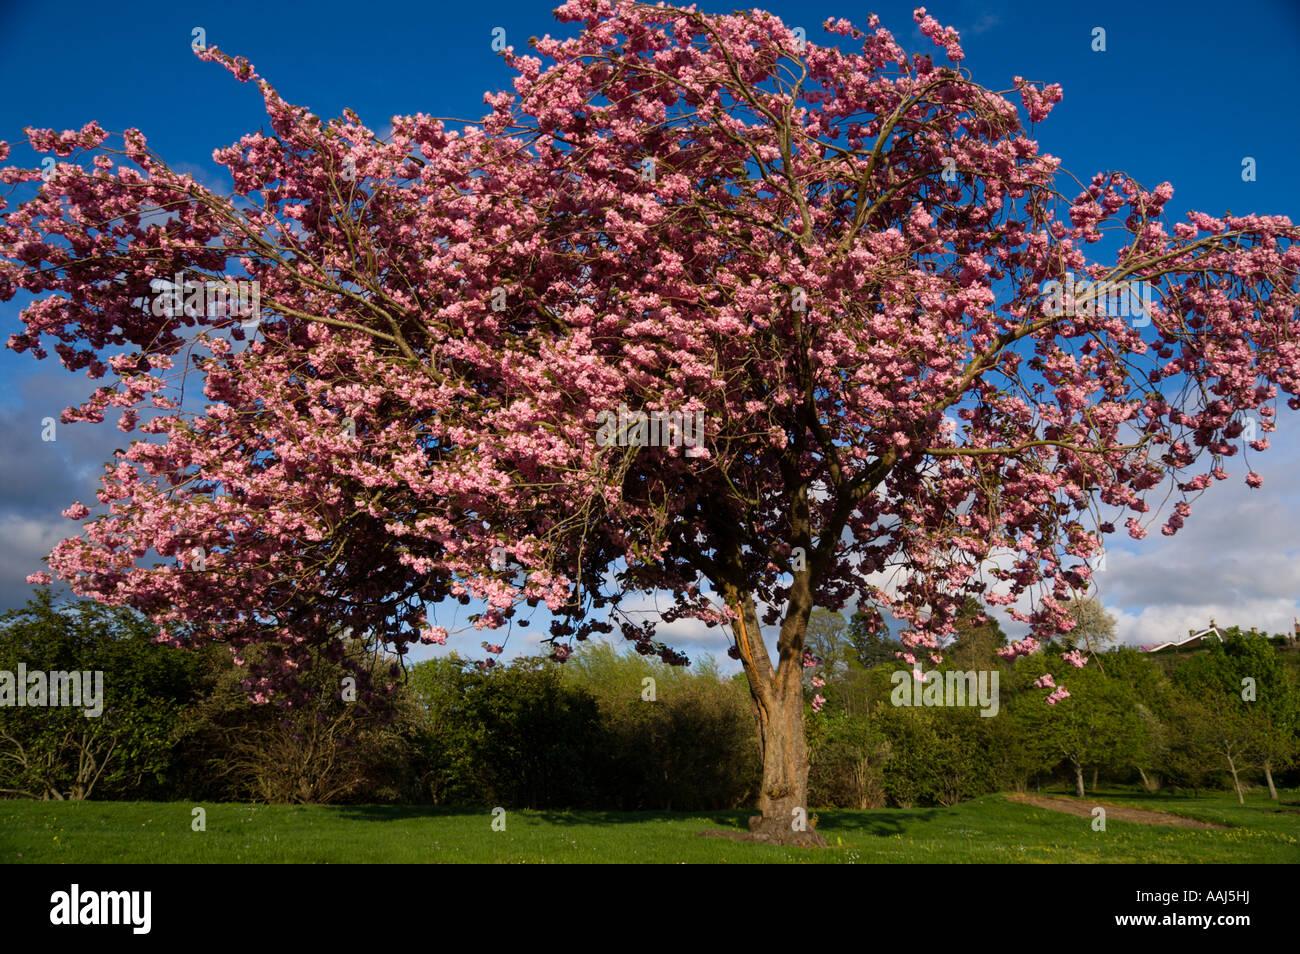 Flowering Cherry Tree In Scottish Park April Prunus Pink Flowers